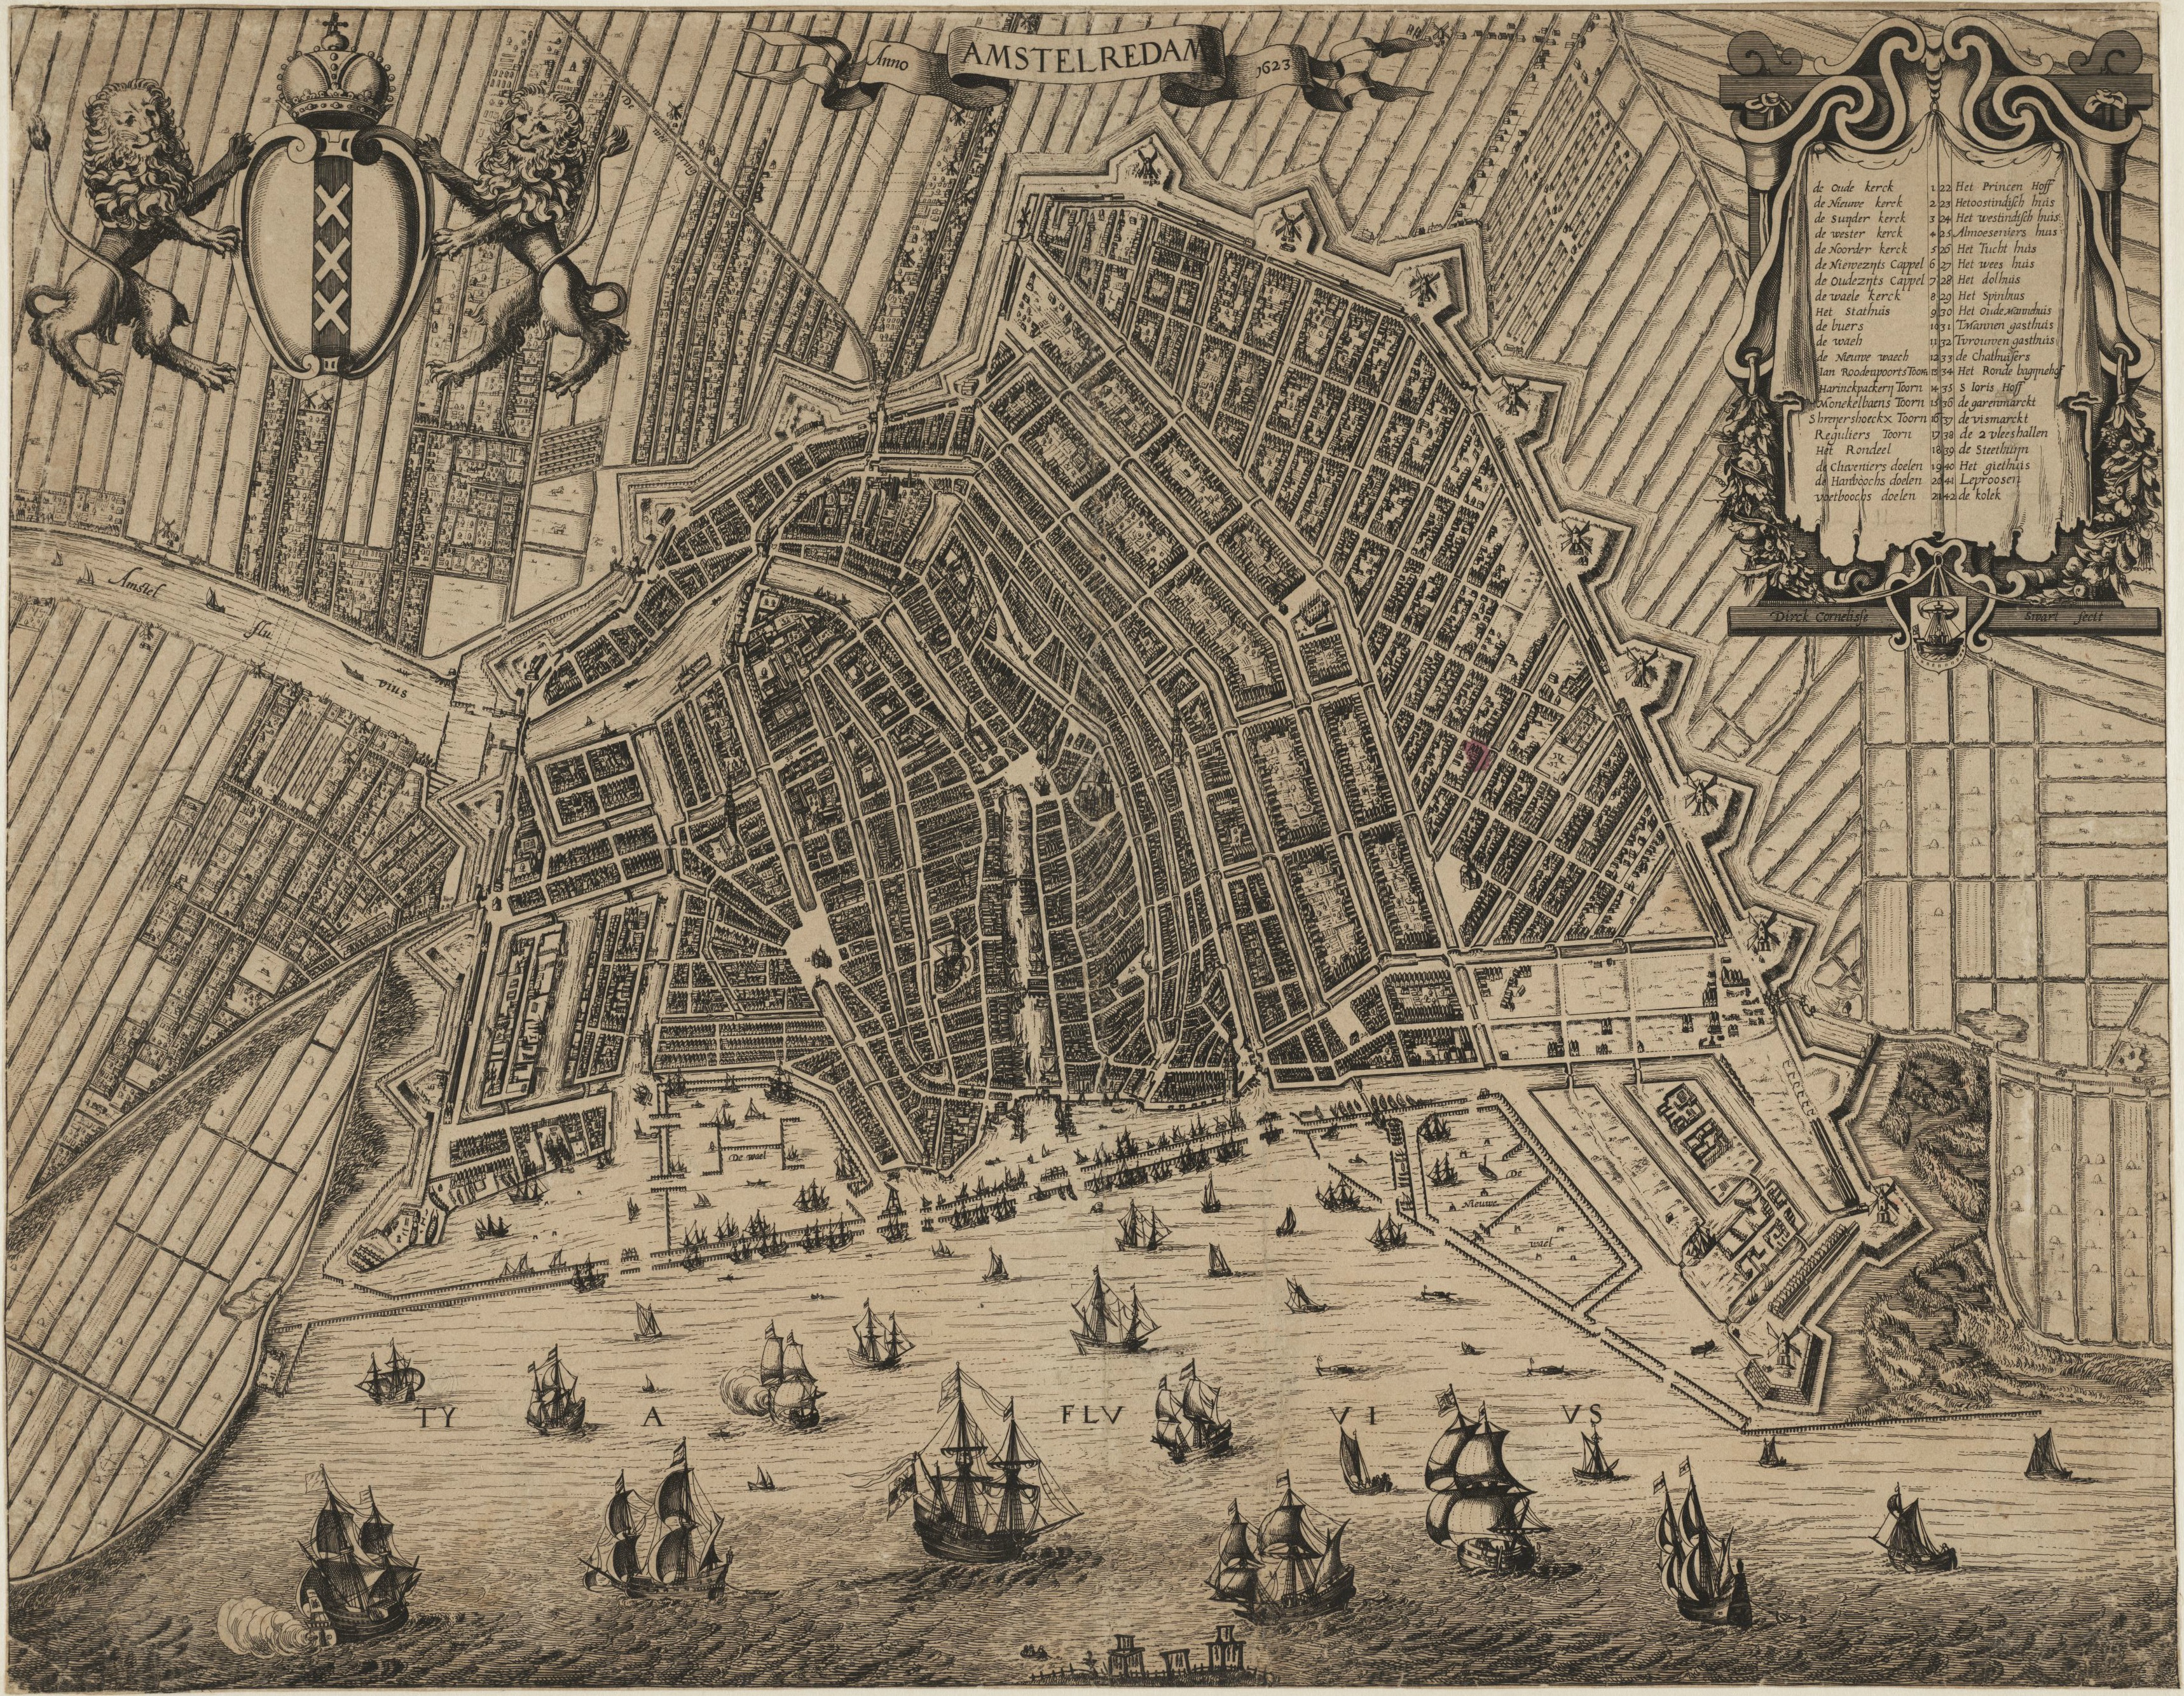 File:Amstelredam Anno 1623 by Dirck Cornelisz. Swart.jpg